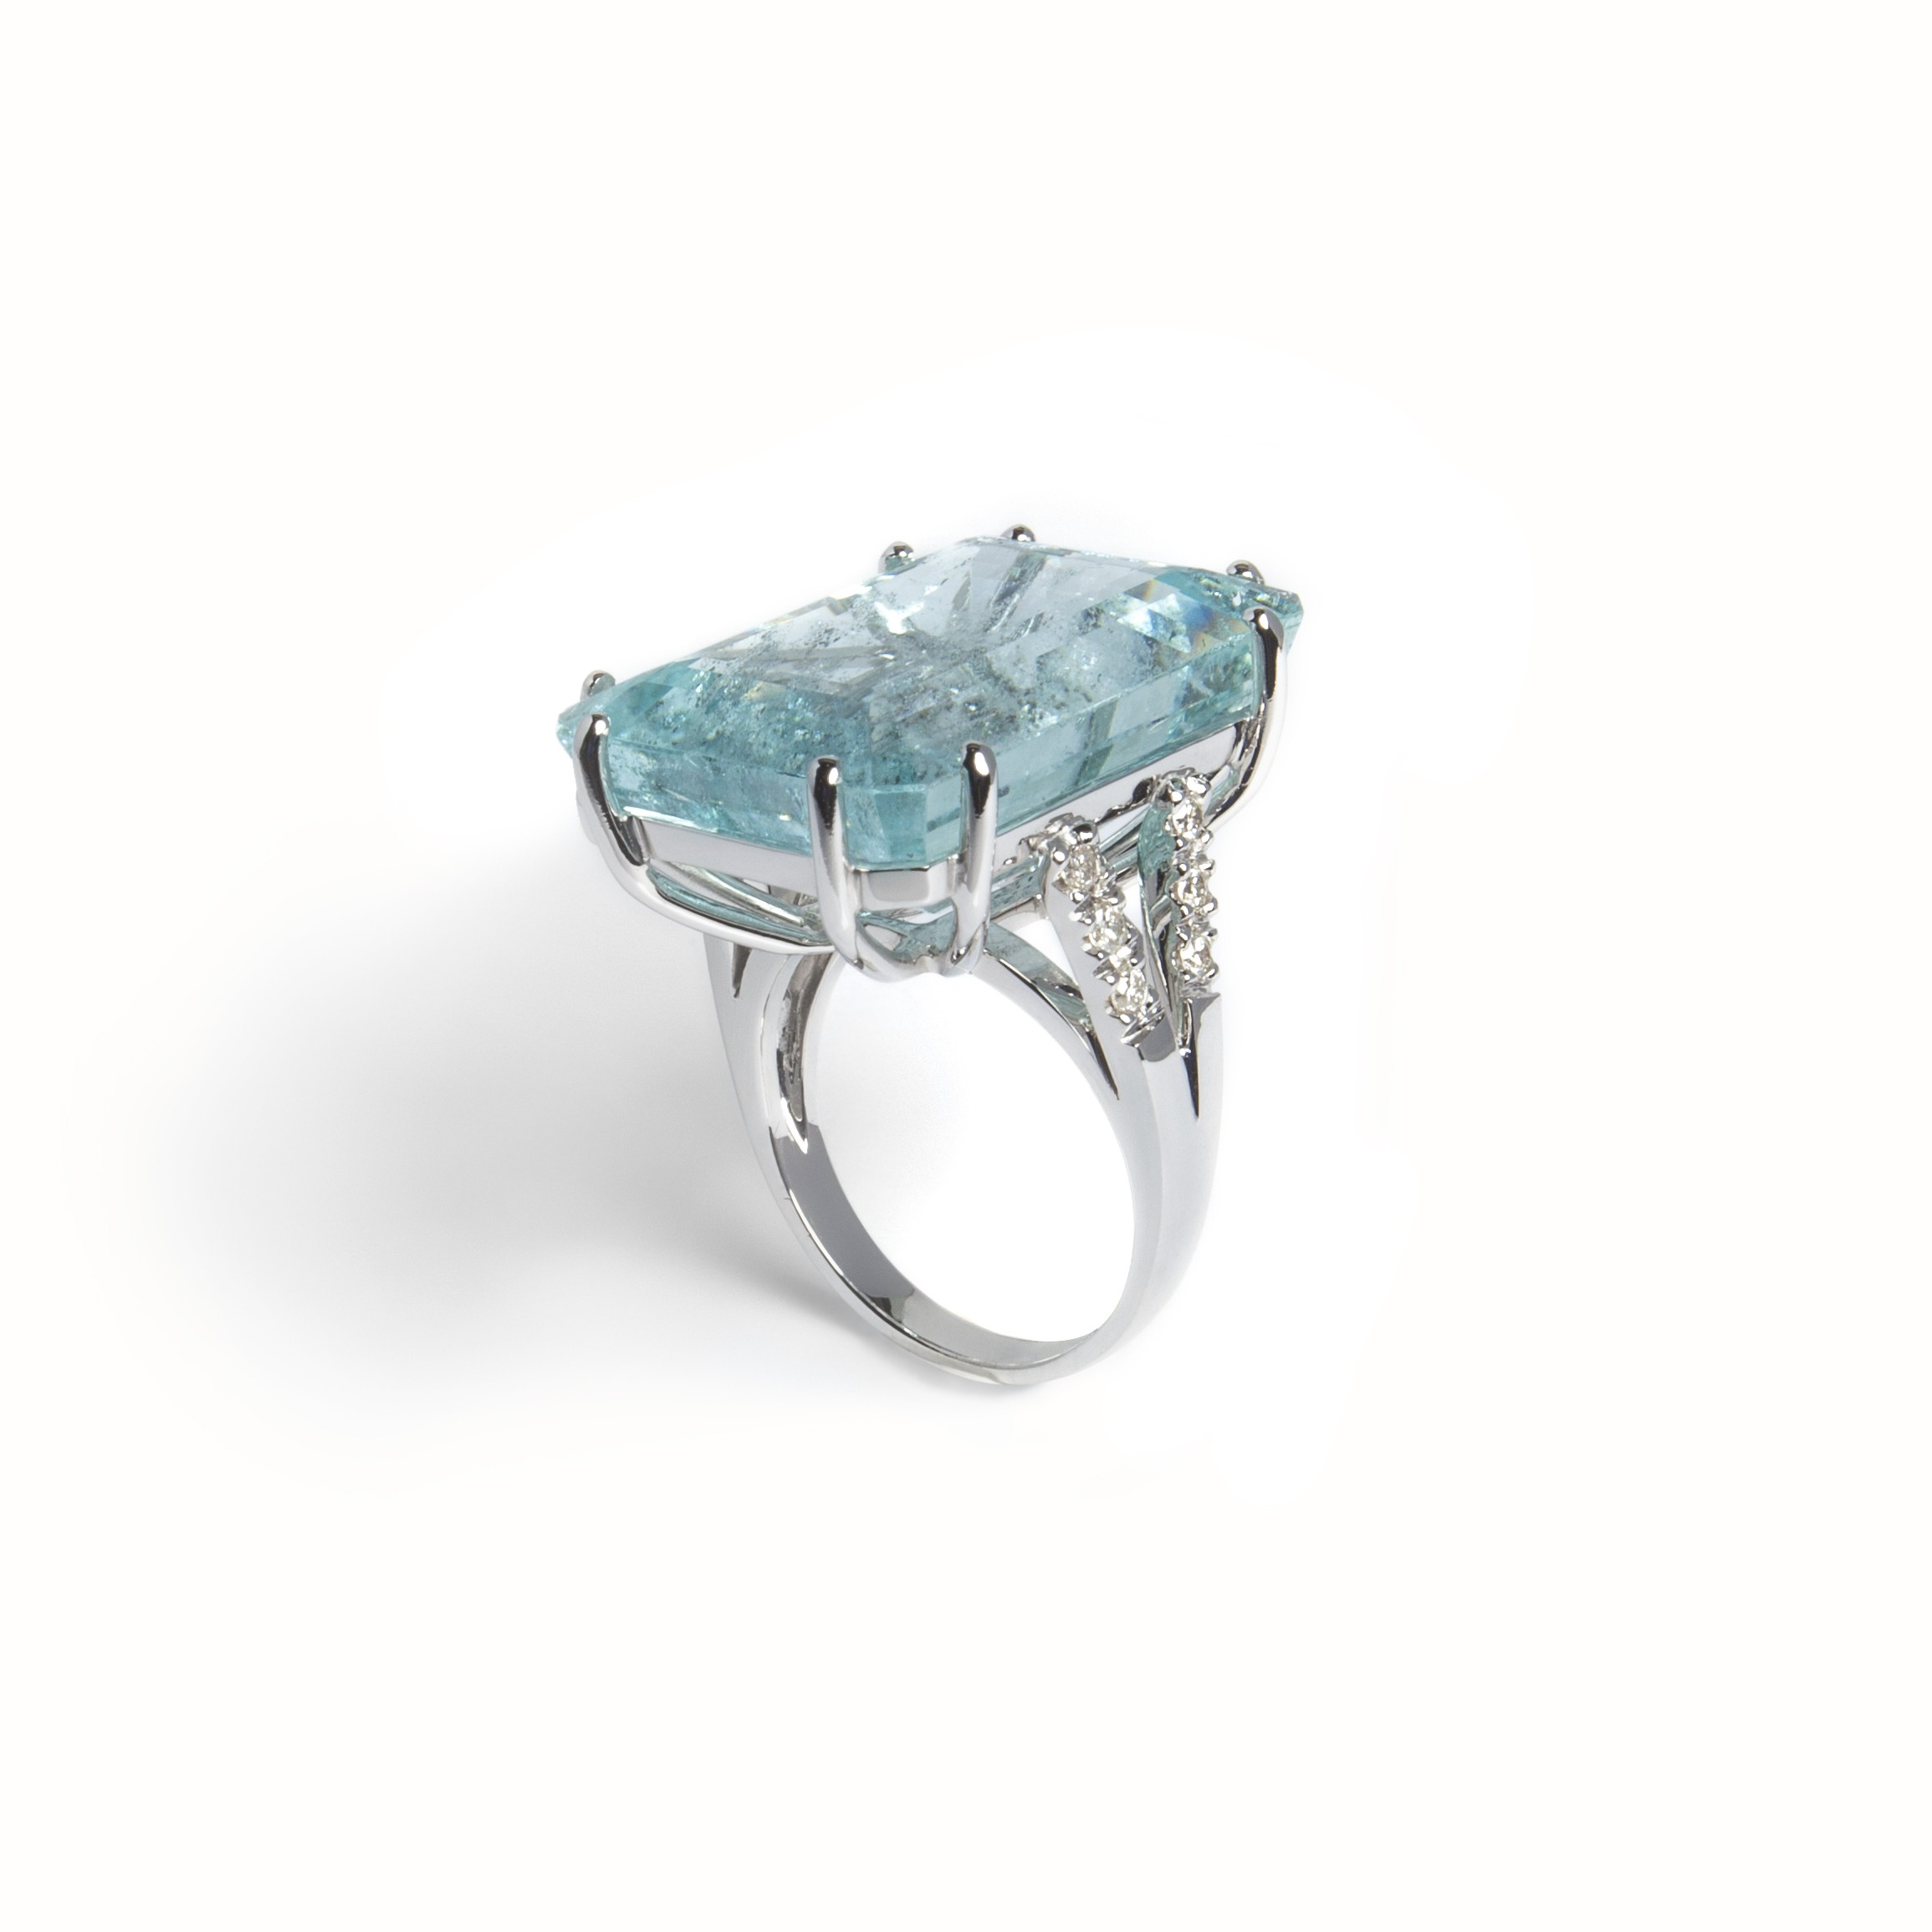 Gold Ring With Diamonds  and Aqua Marine